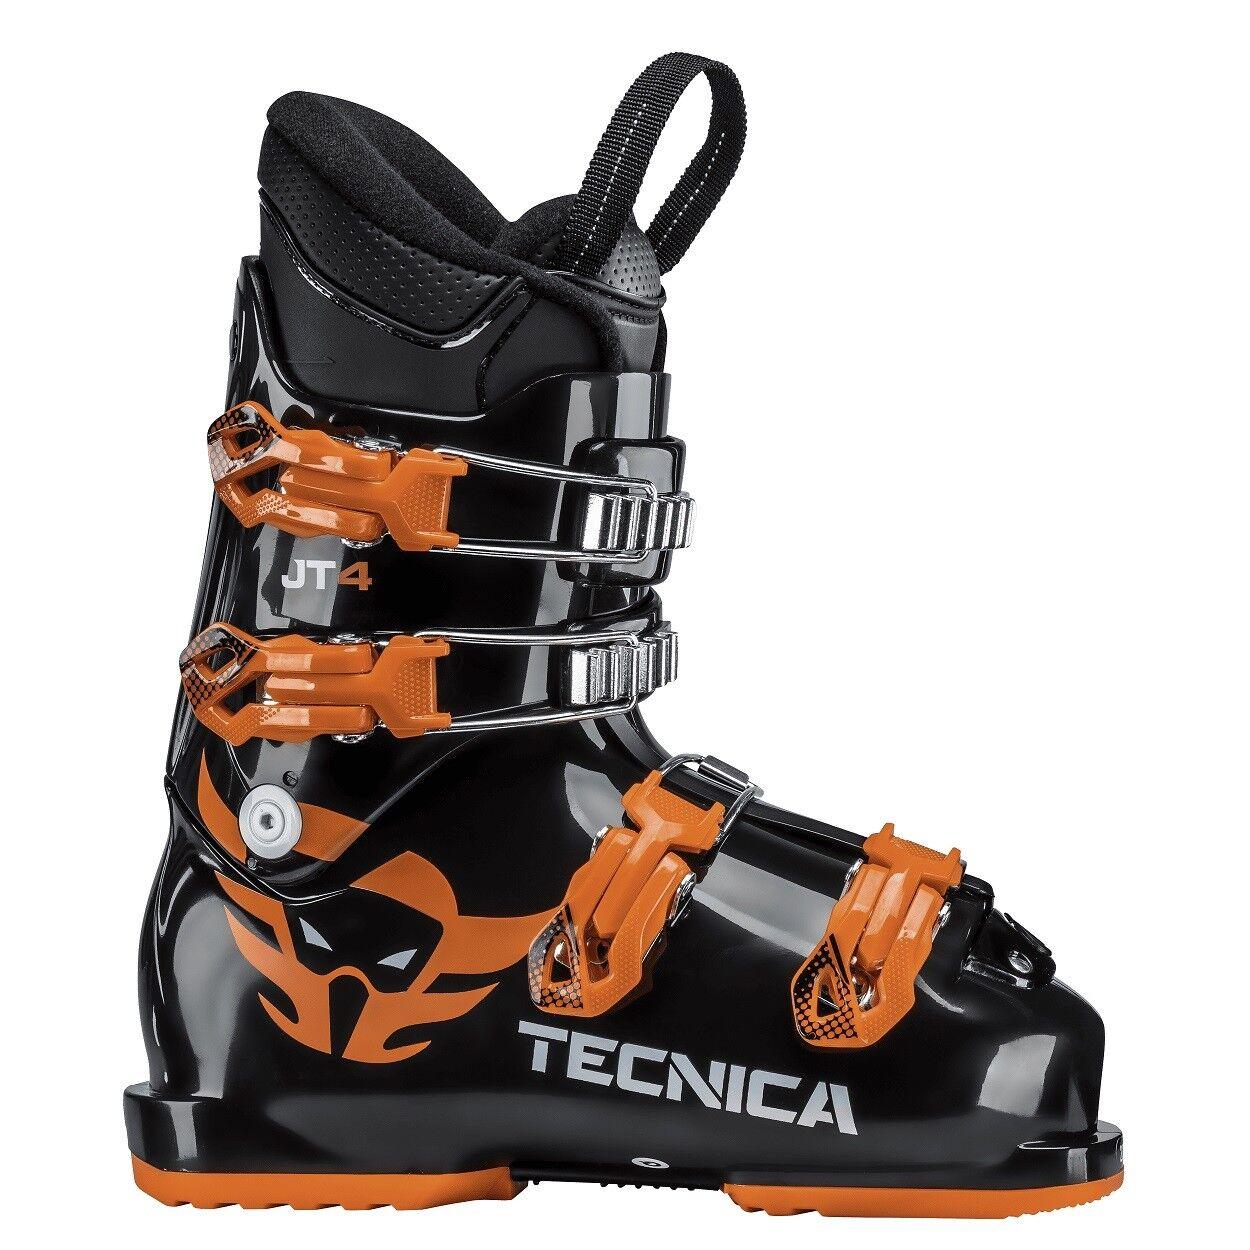 Tecnica JT - 4 botas de esquí - 2019 - adolescentes - 26,5 MP